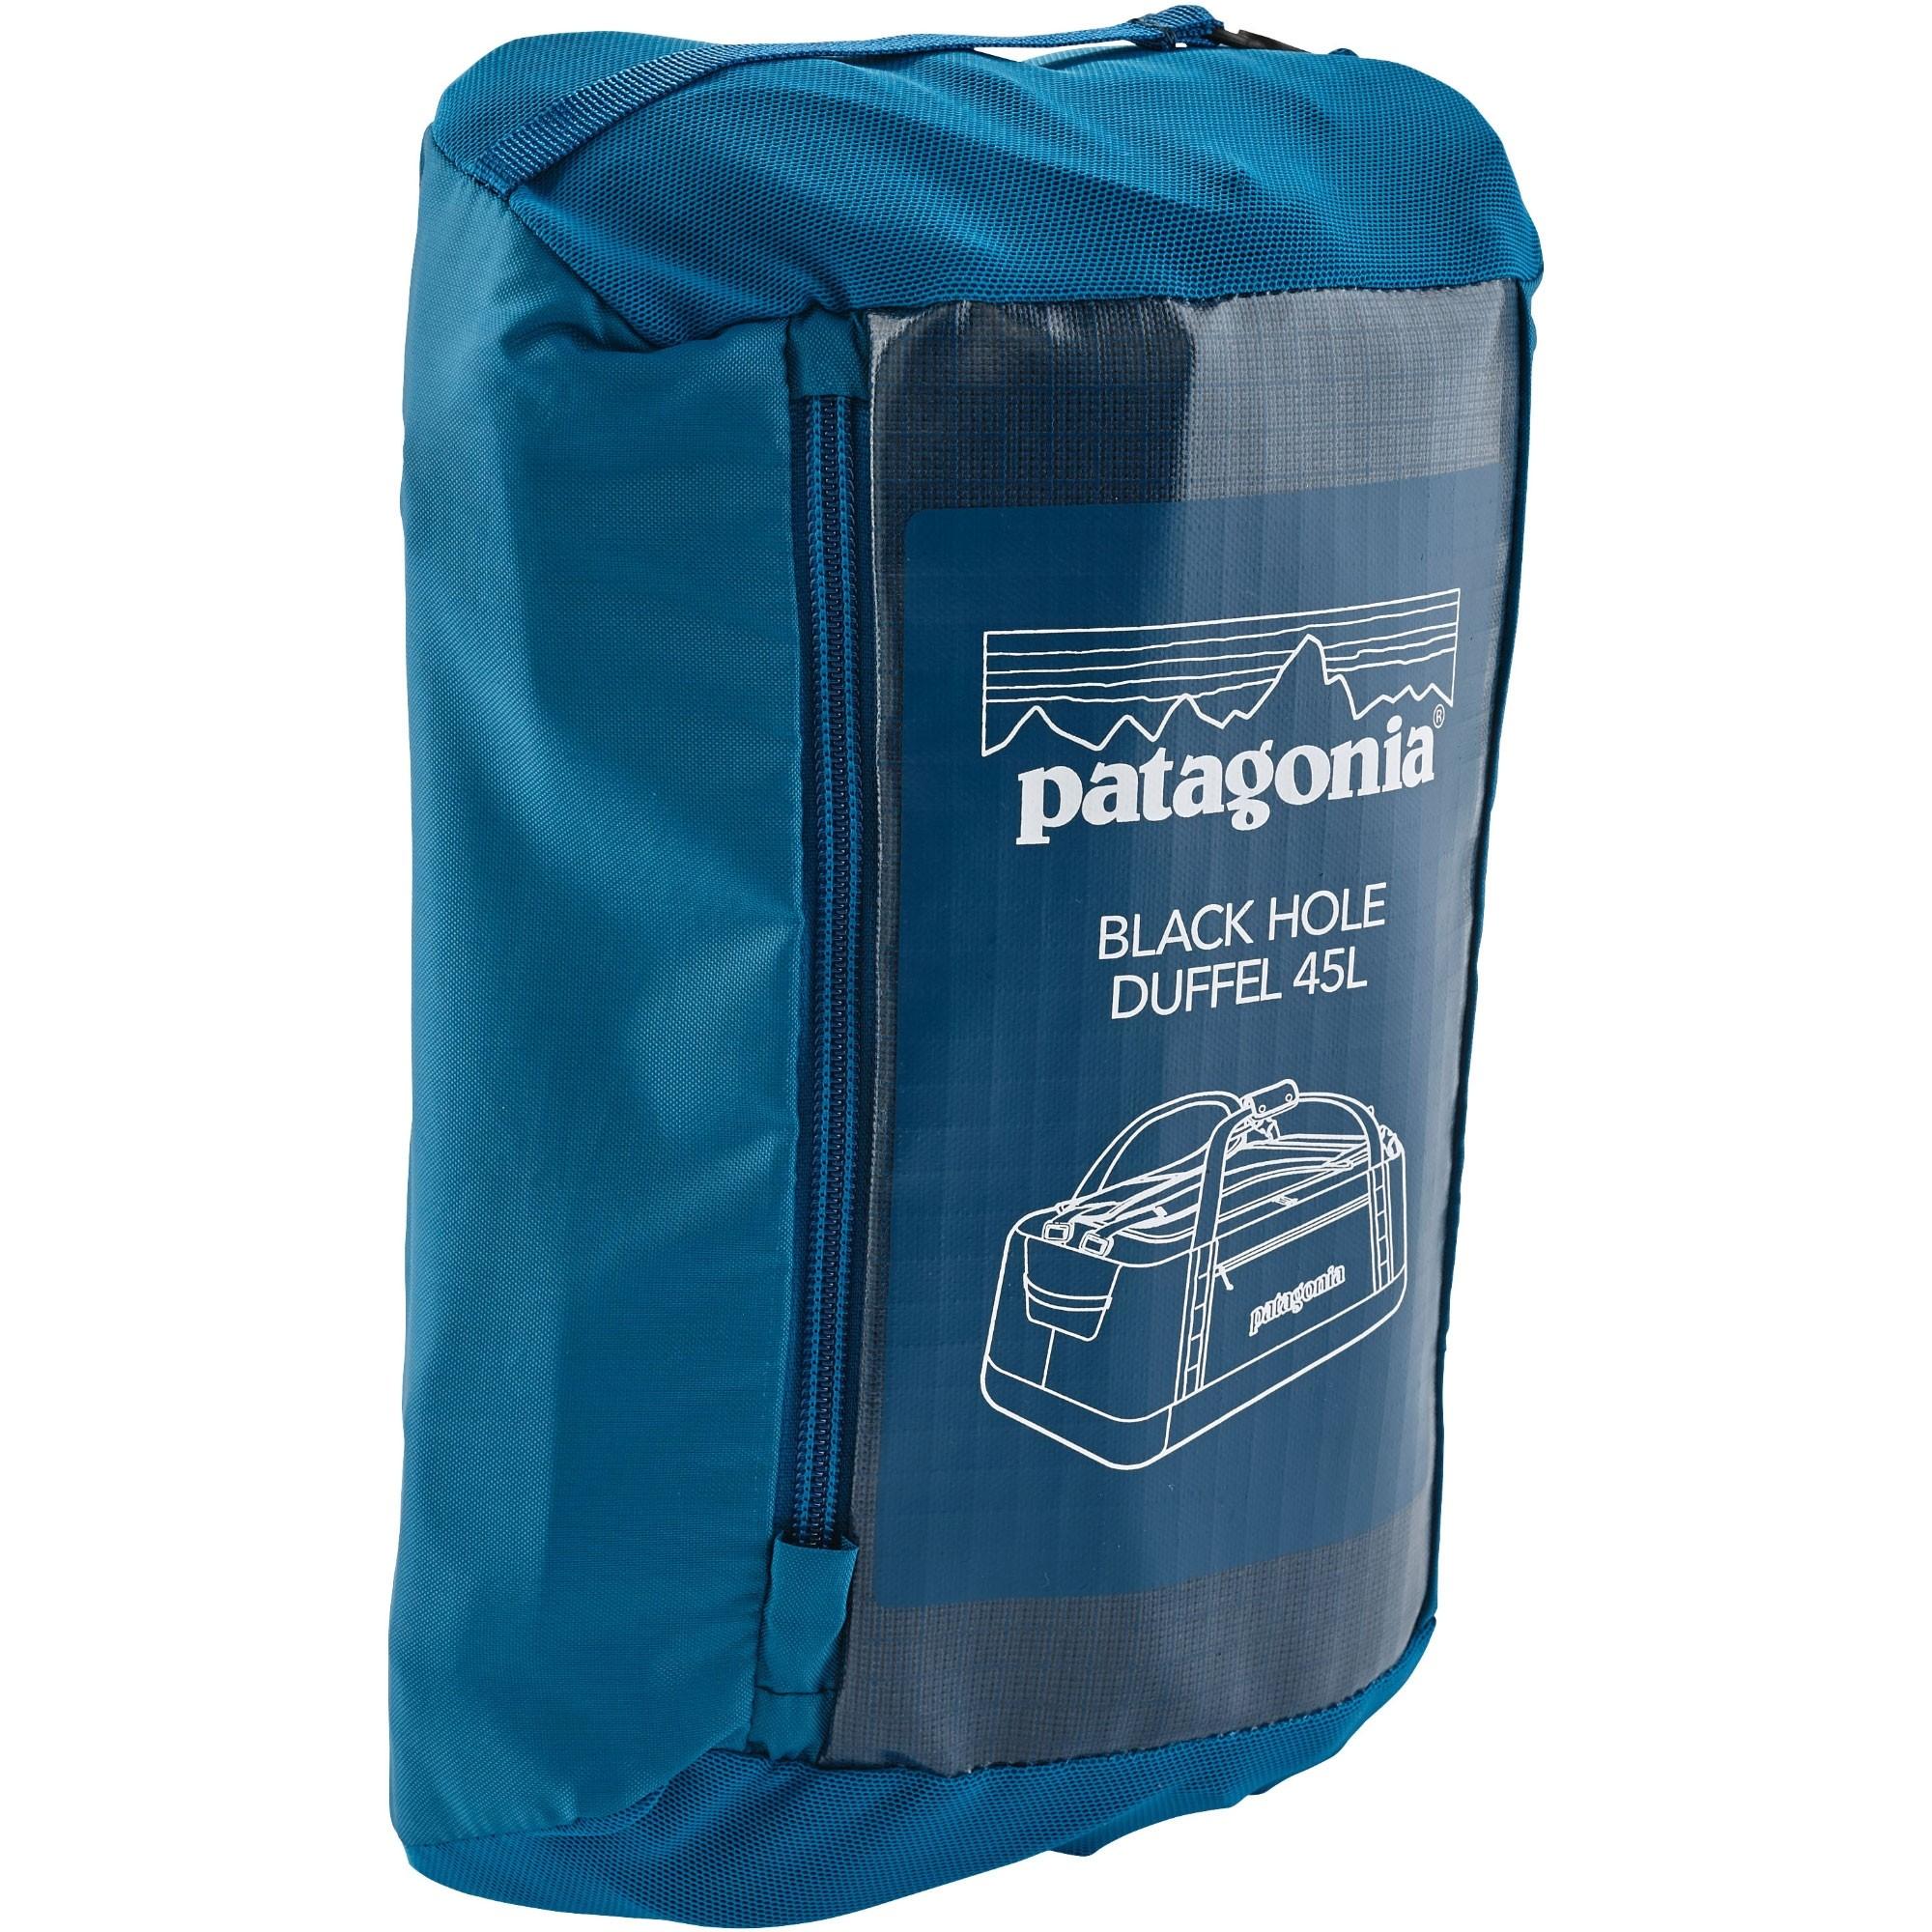 Patagonia Black Hole Duffel 45 litres - Big Sur Blue